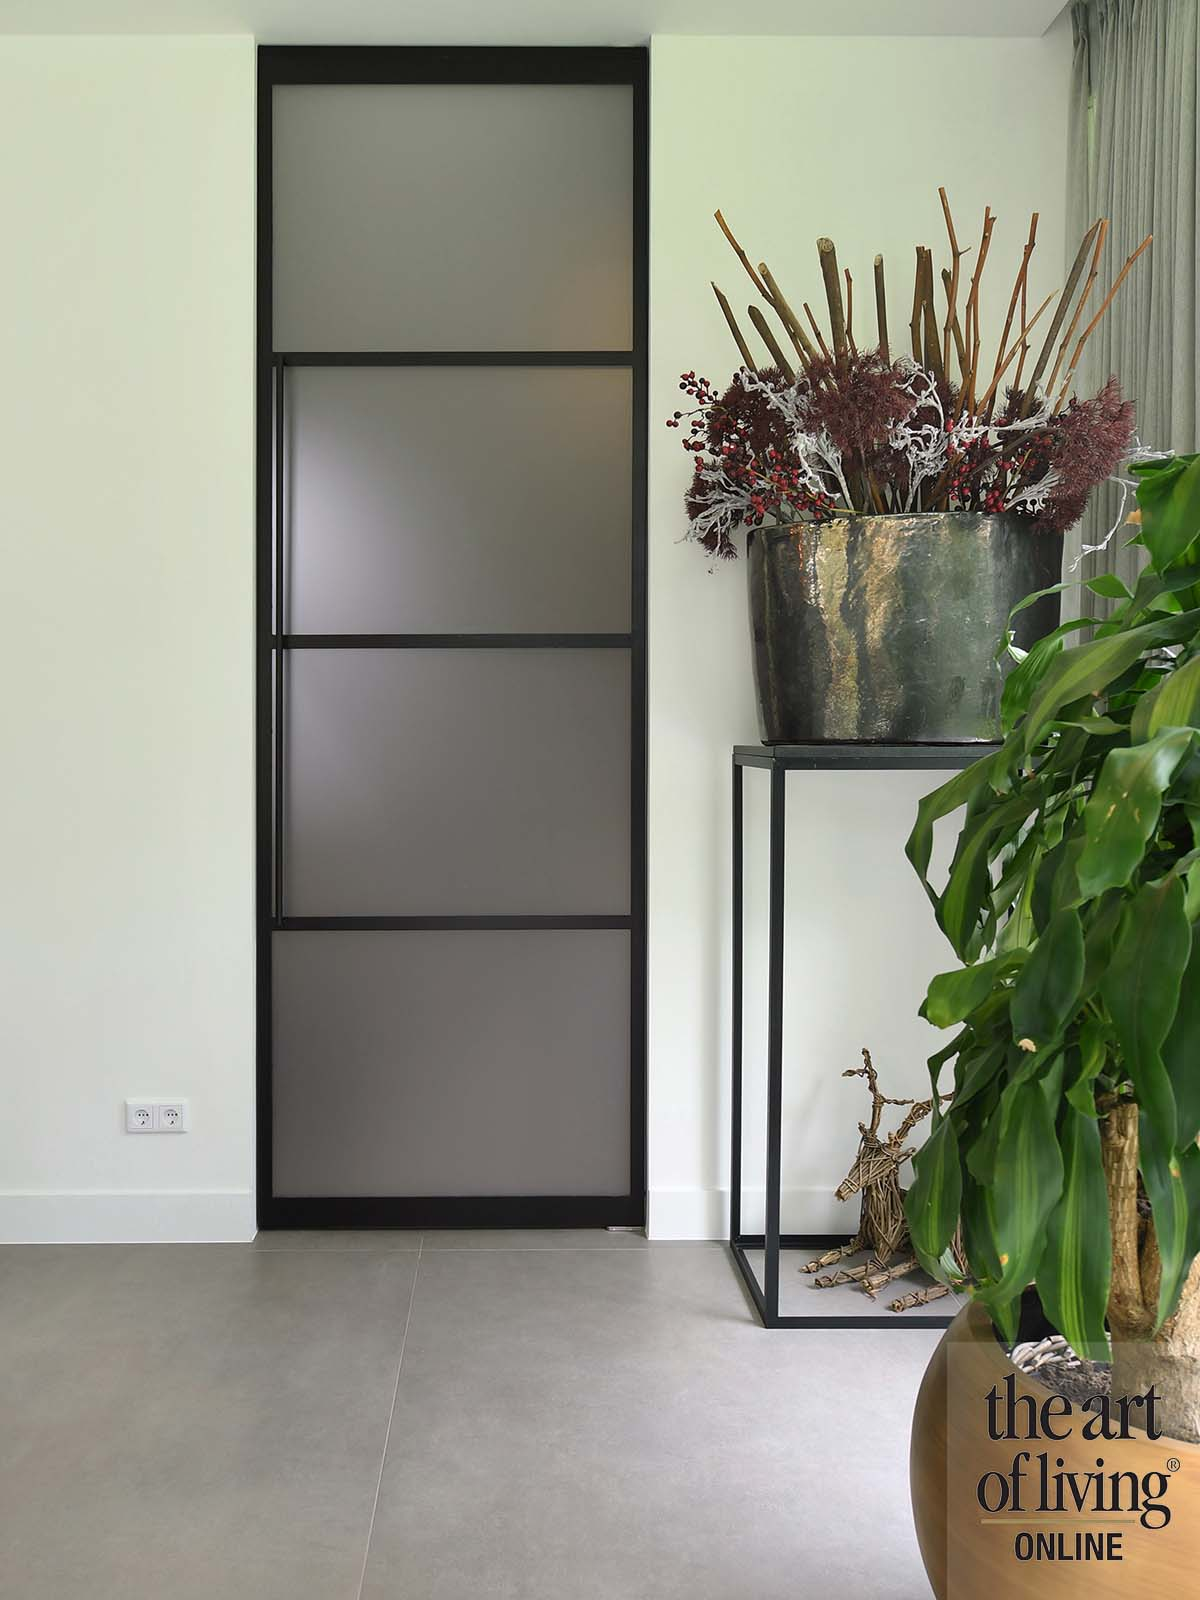 Moderne villa | Faam Architecten, the art of living